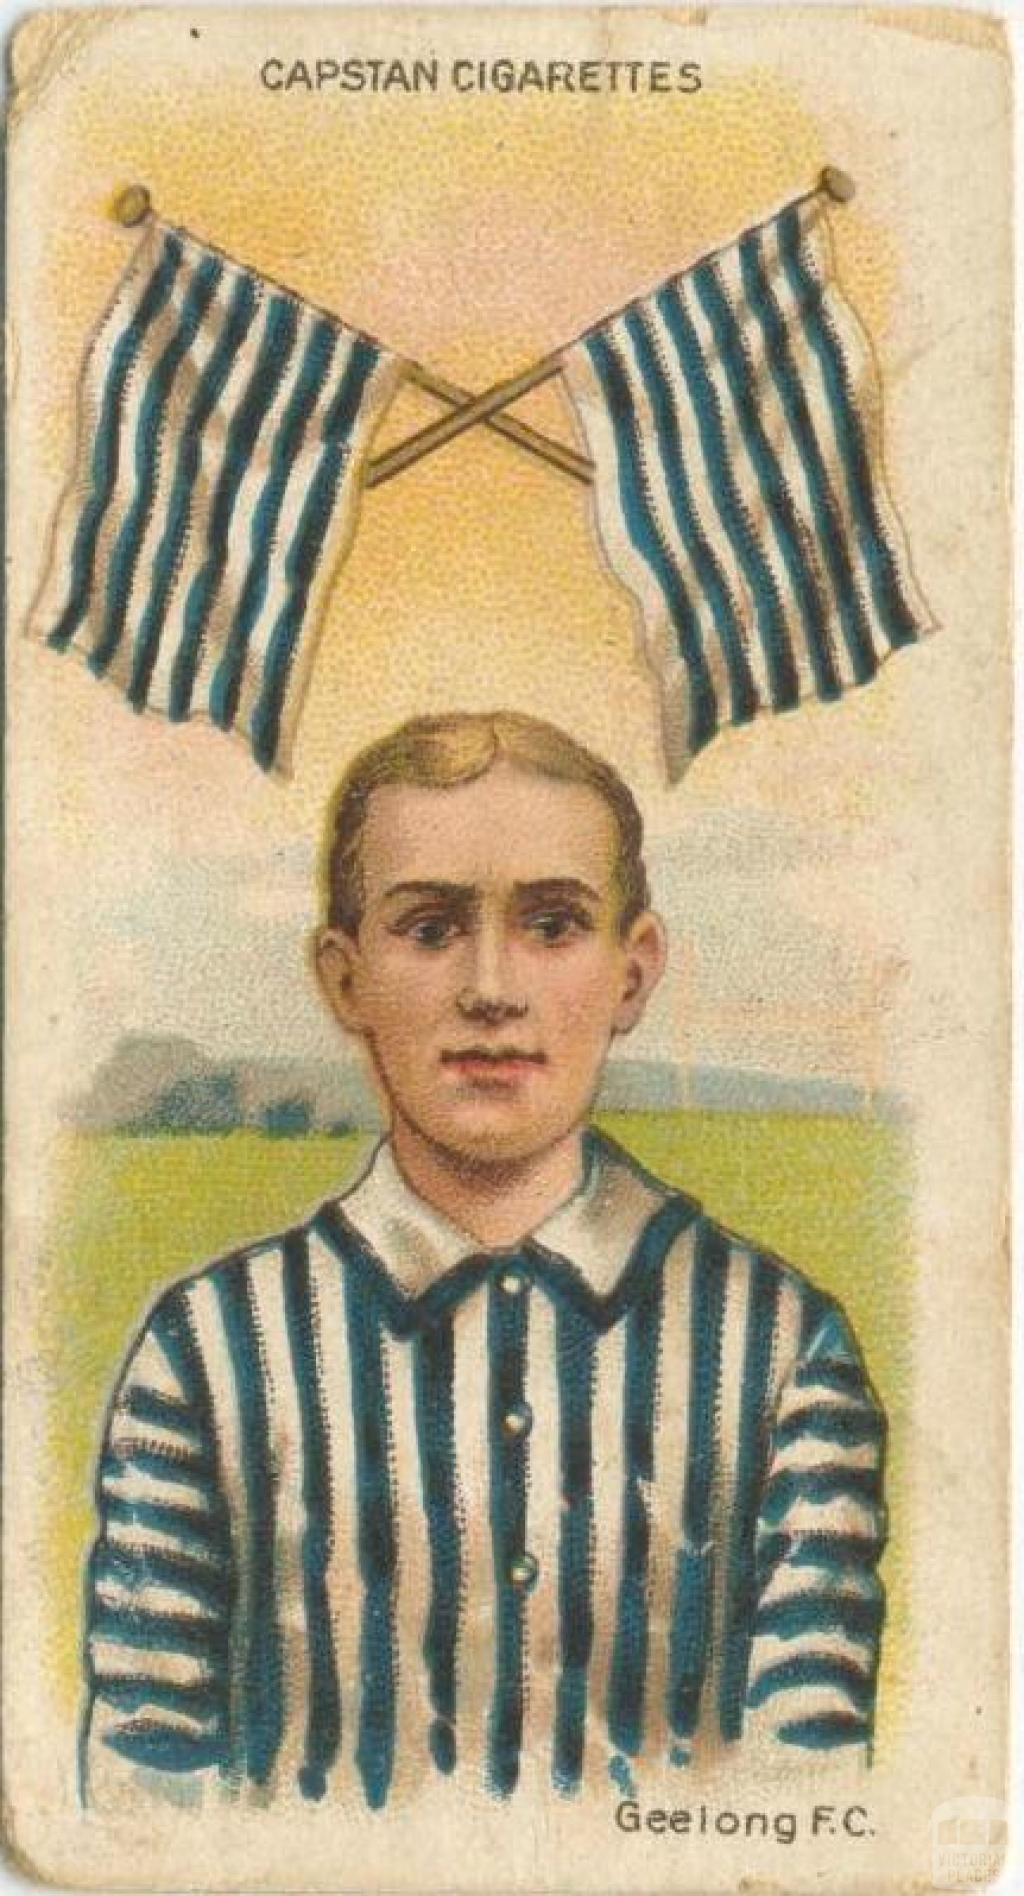 Geelong Football Club, Capstan Cigarettes Card